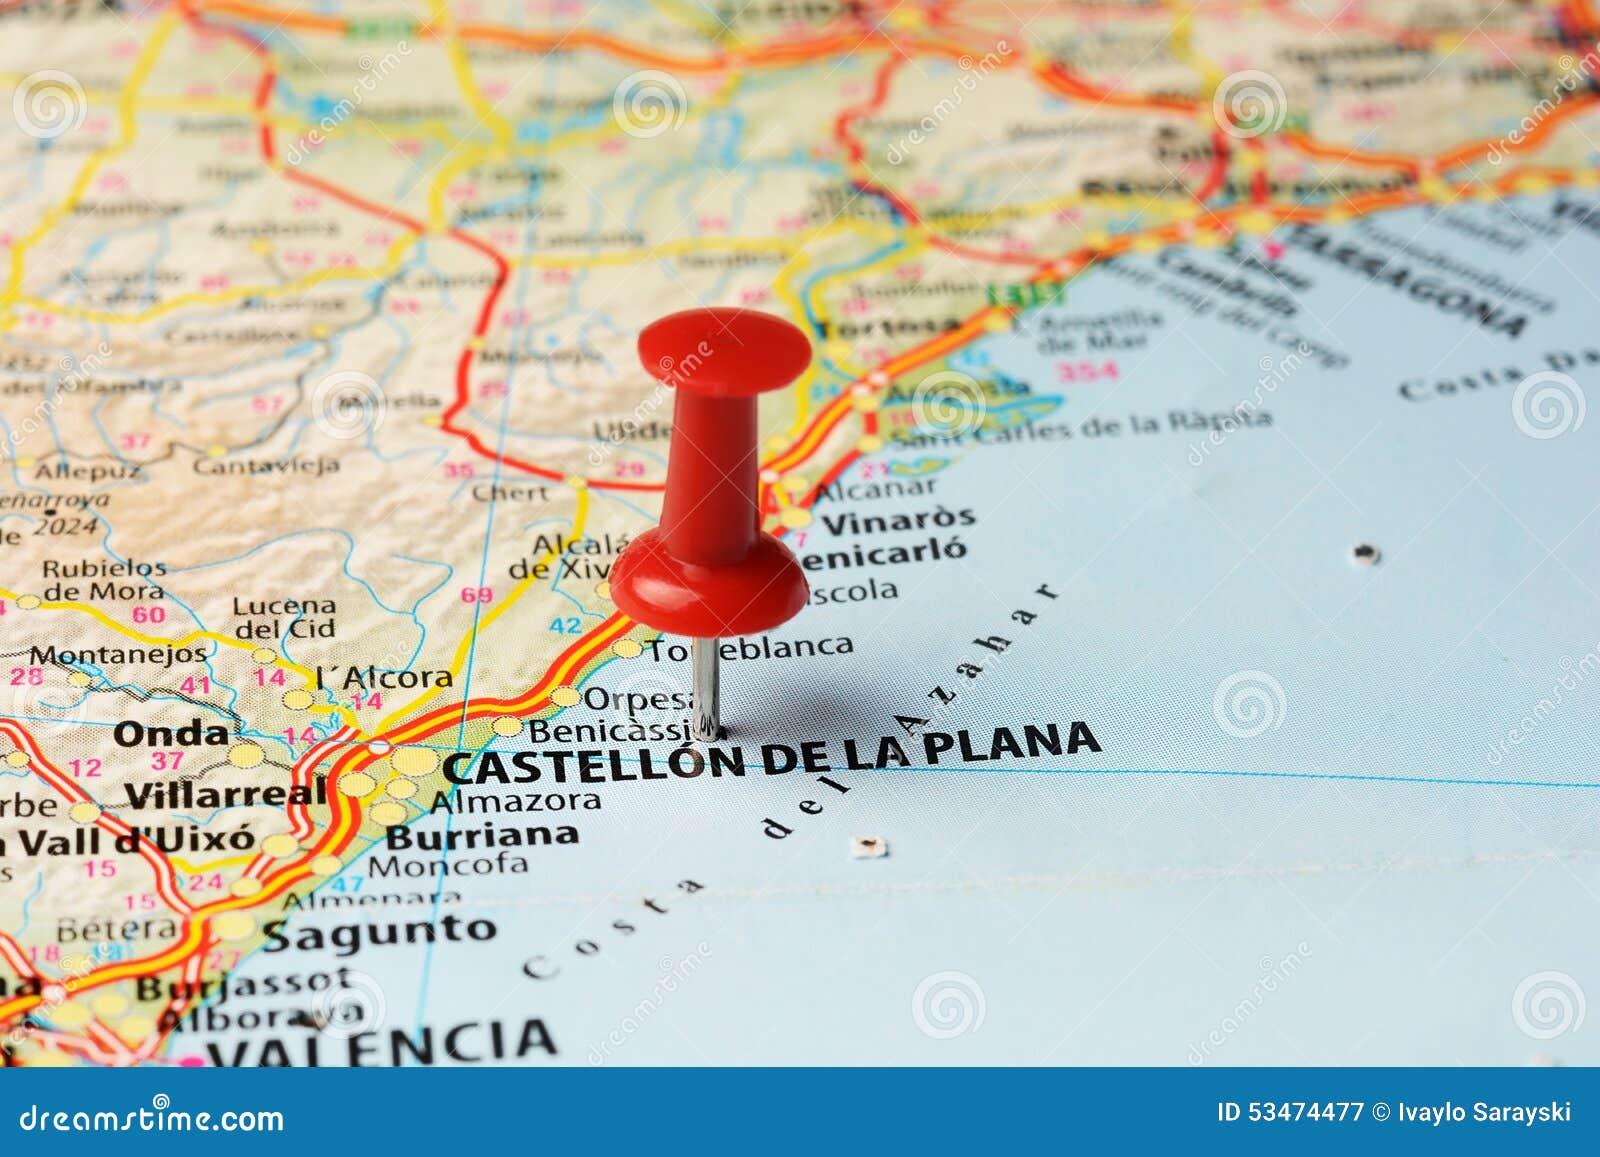 Castellon De La Plana Map Pin Stock Image Image Of Organize